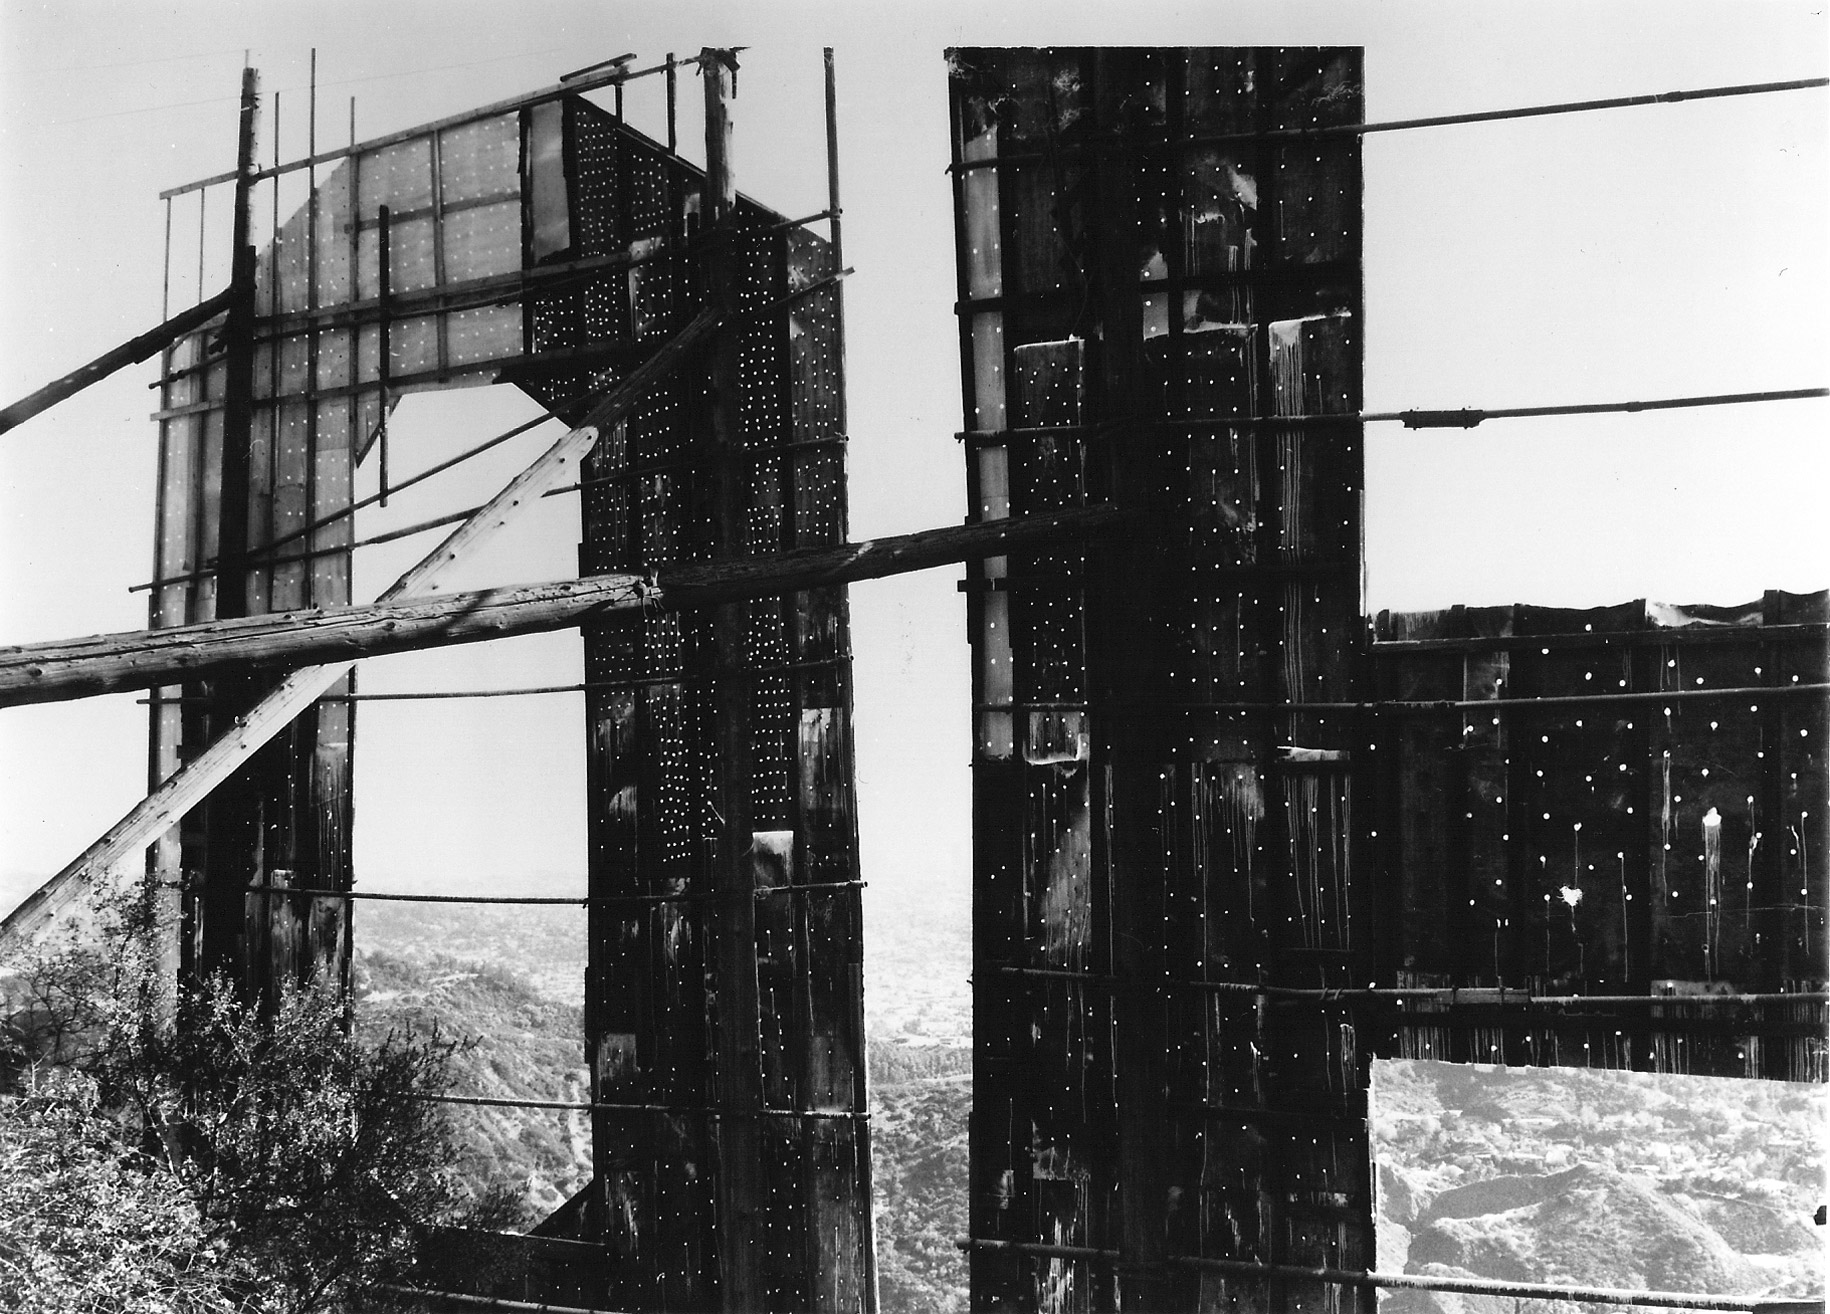 Hollywood sign in disrepair, 1973.